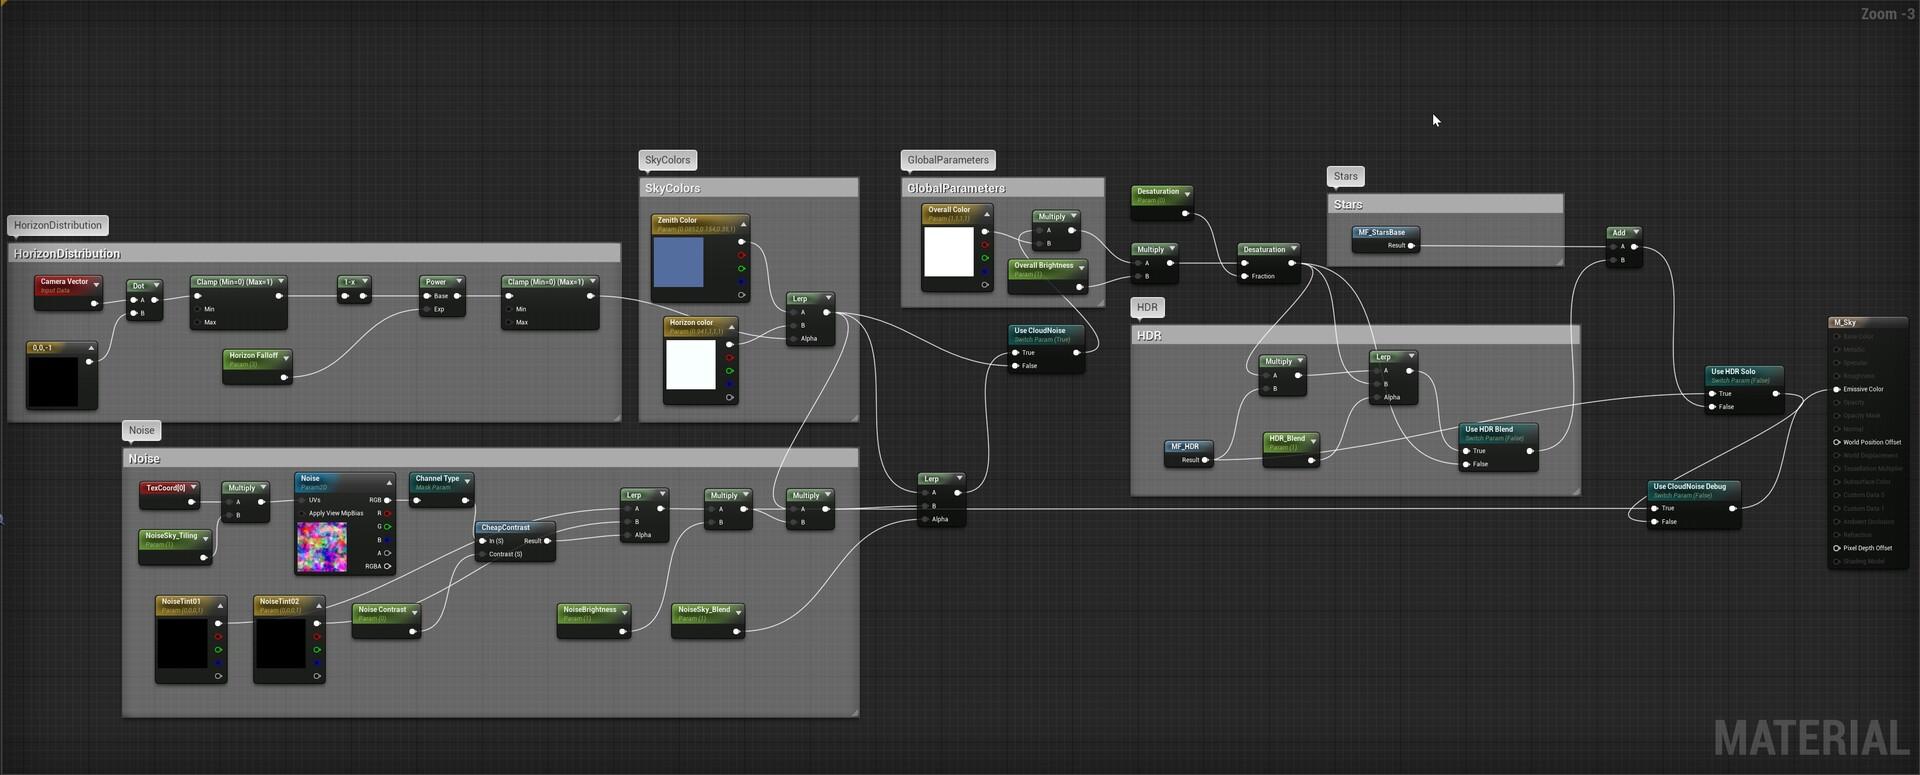 Custom Sky shader in Unreal Engine.